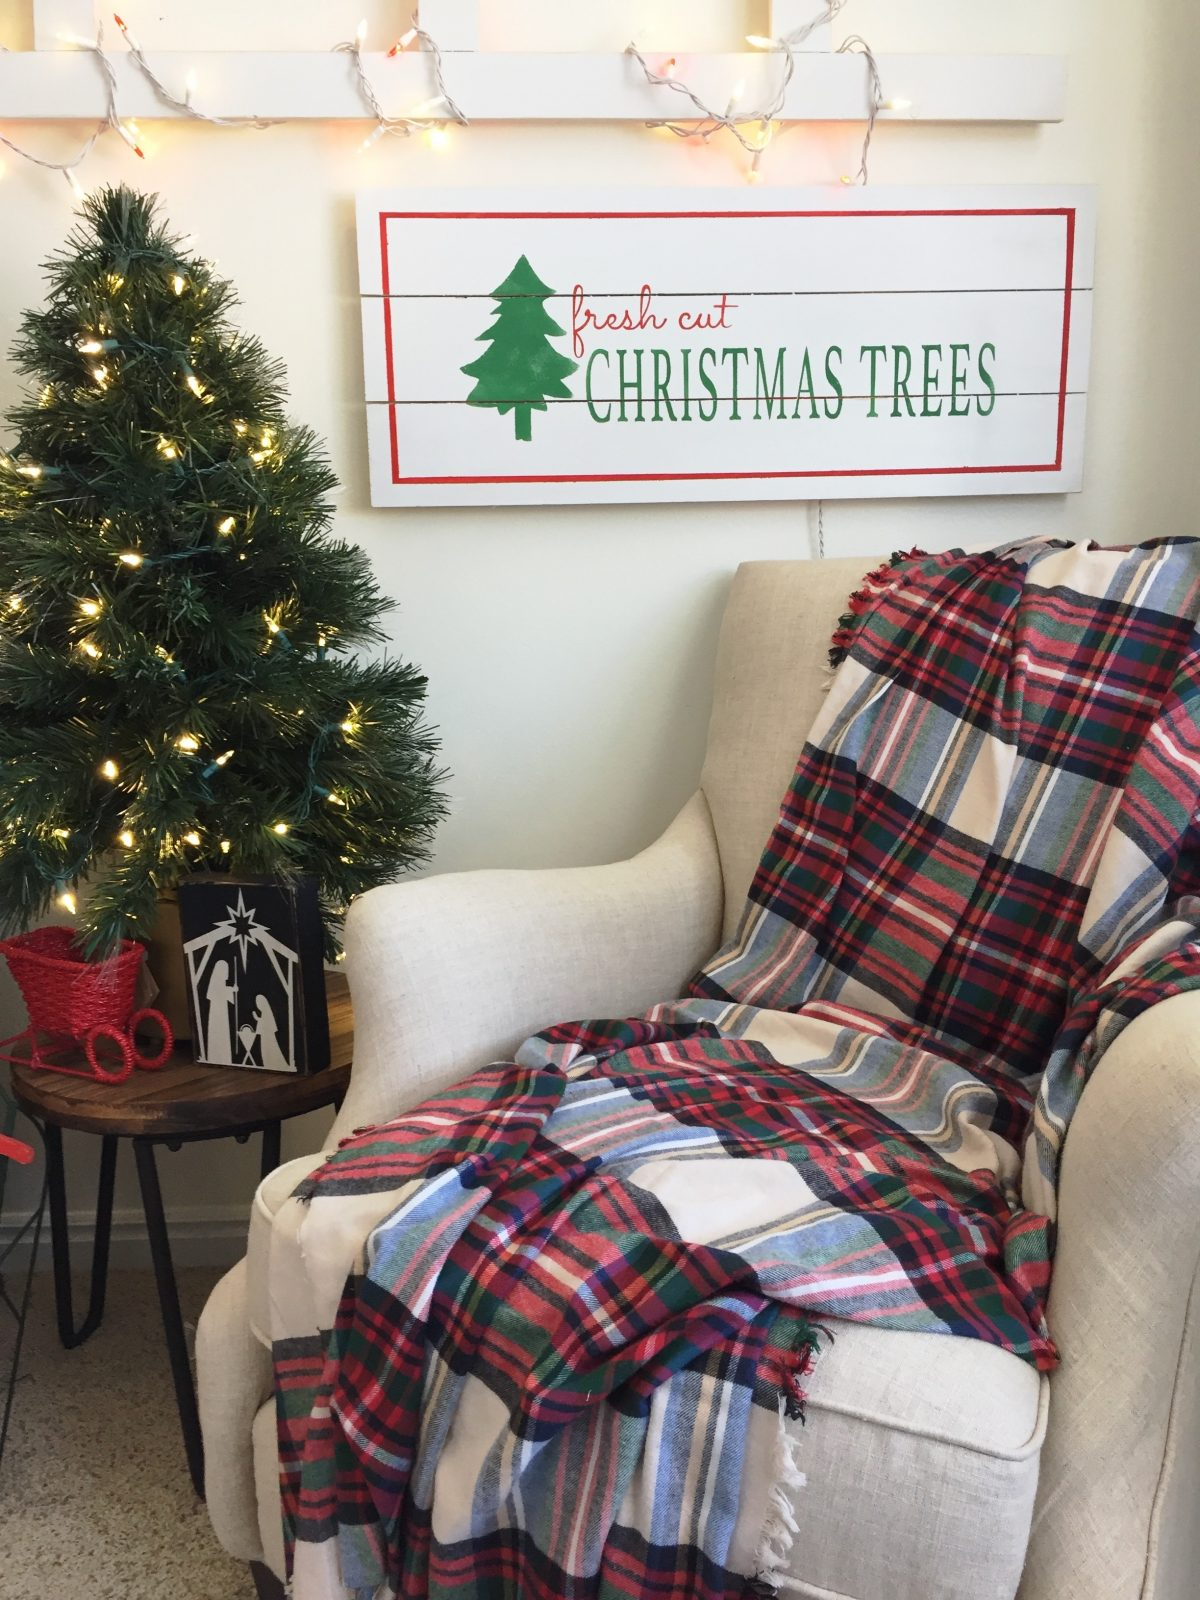 Fresh Cut Christmas Trees Sign.Fresh Cut Christmas Trees Sign Craft Night The Schmidt Home